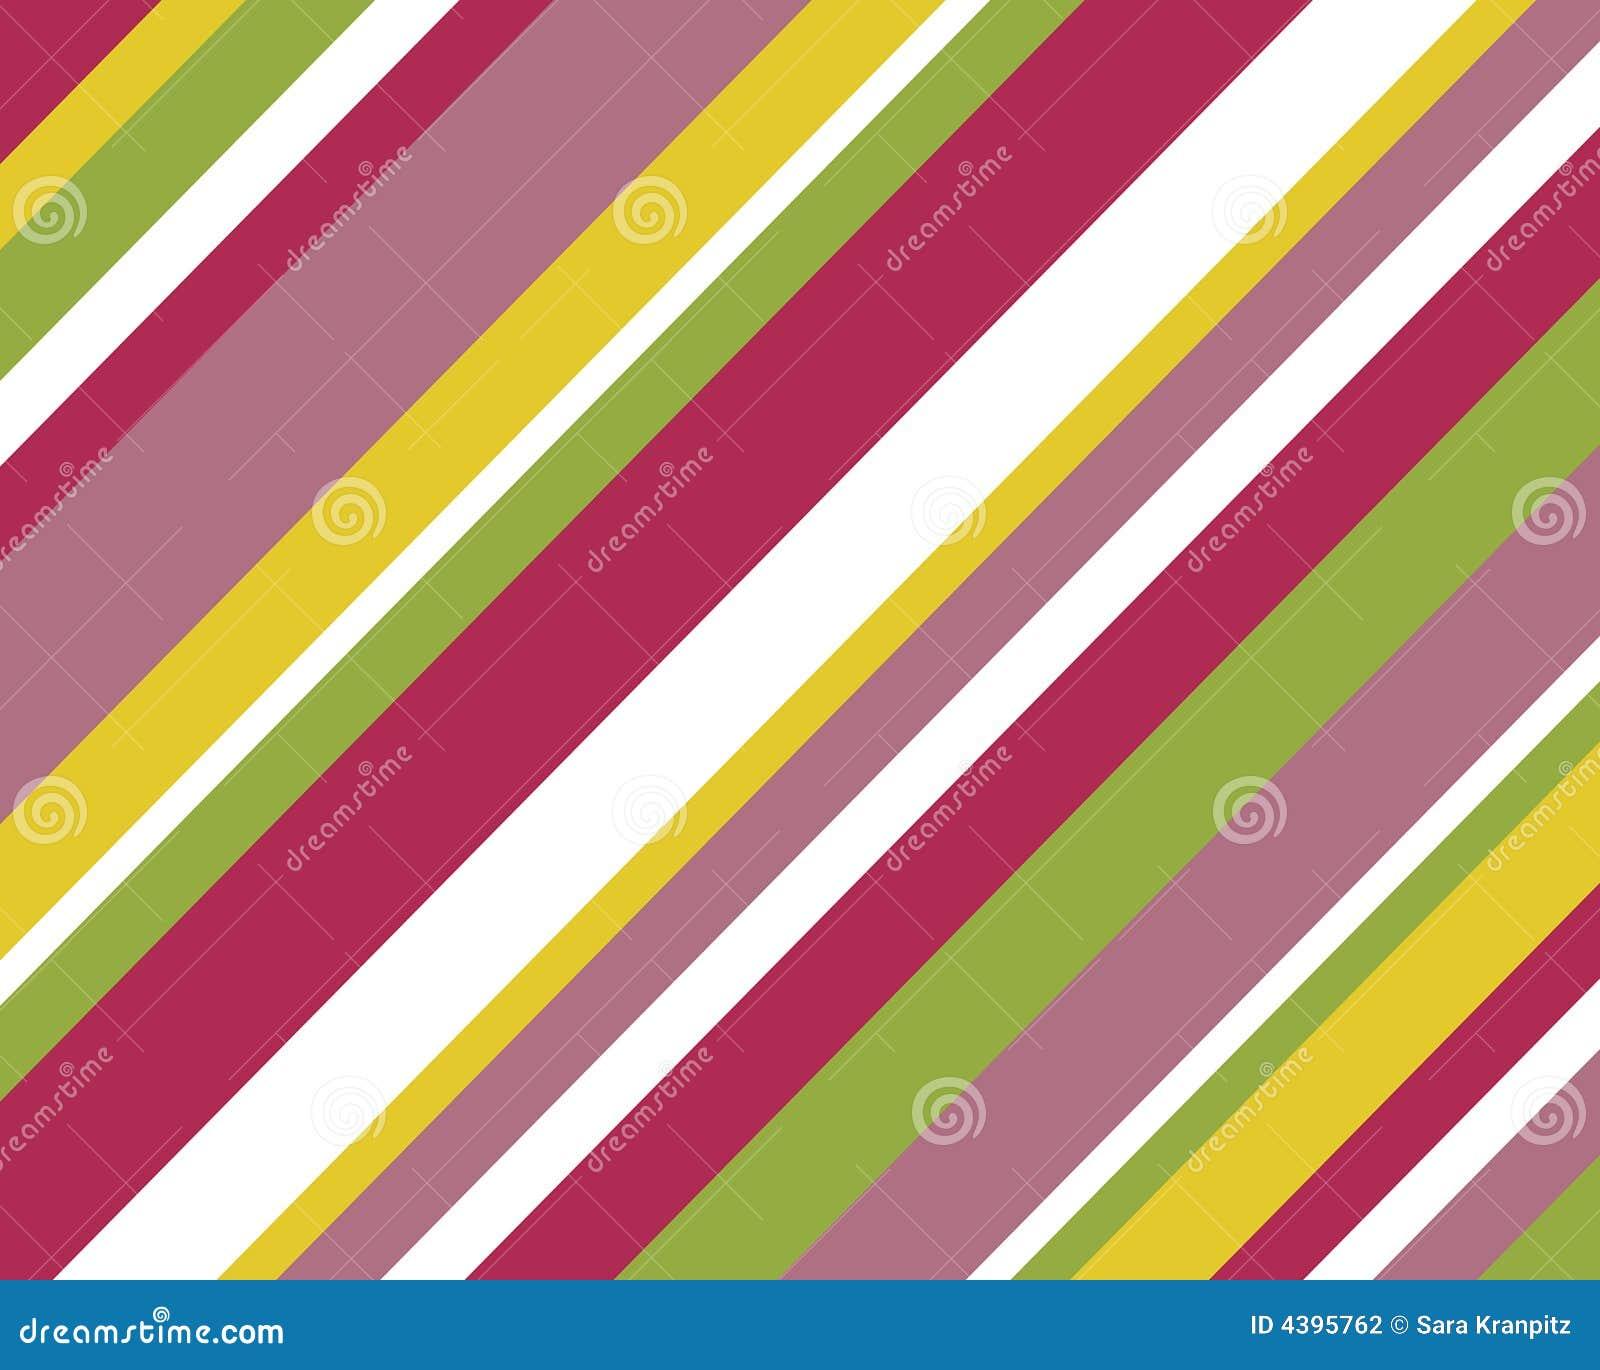 Retro colorful stripes background